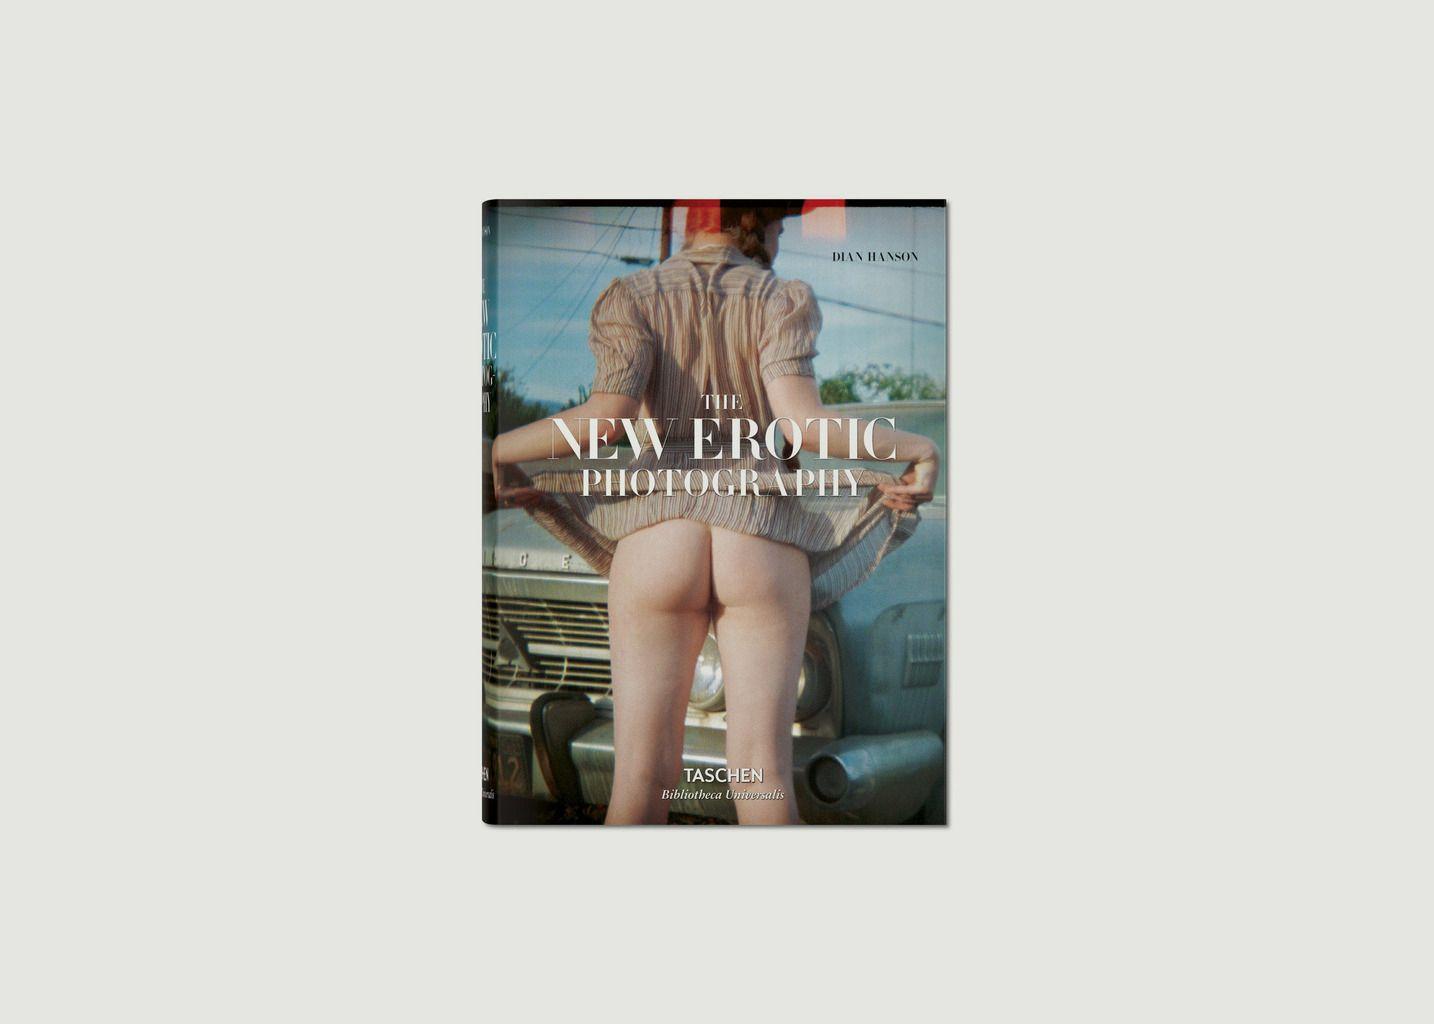 Livre The New Erotic Photography - Taschen